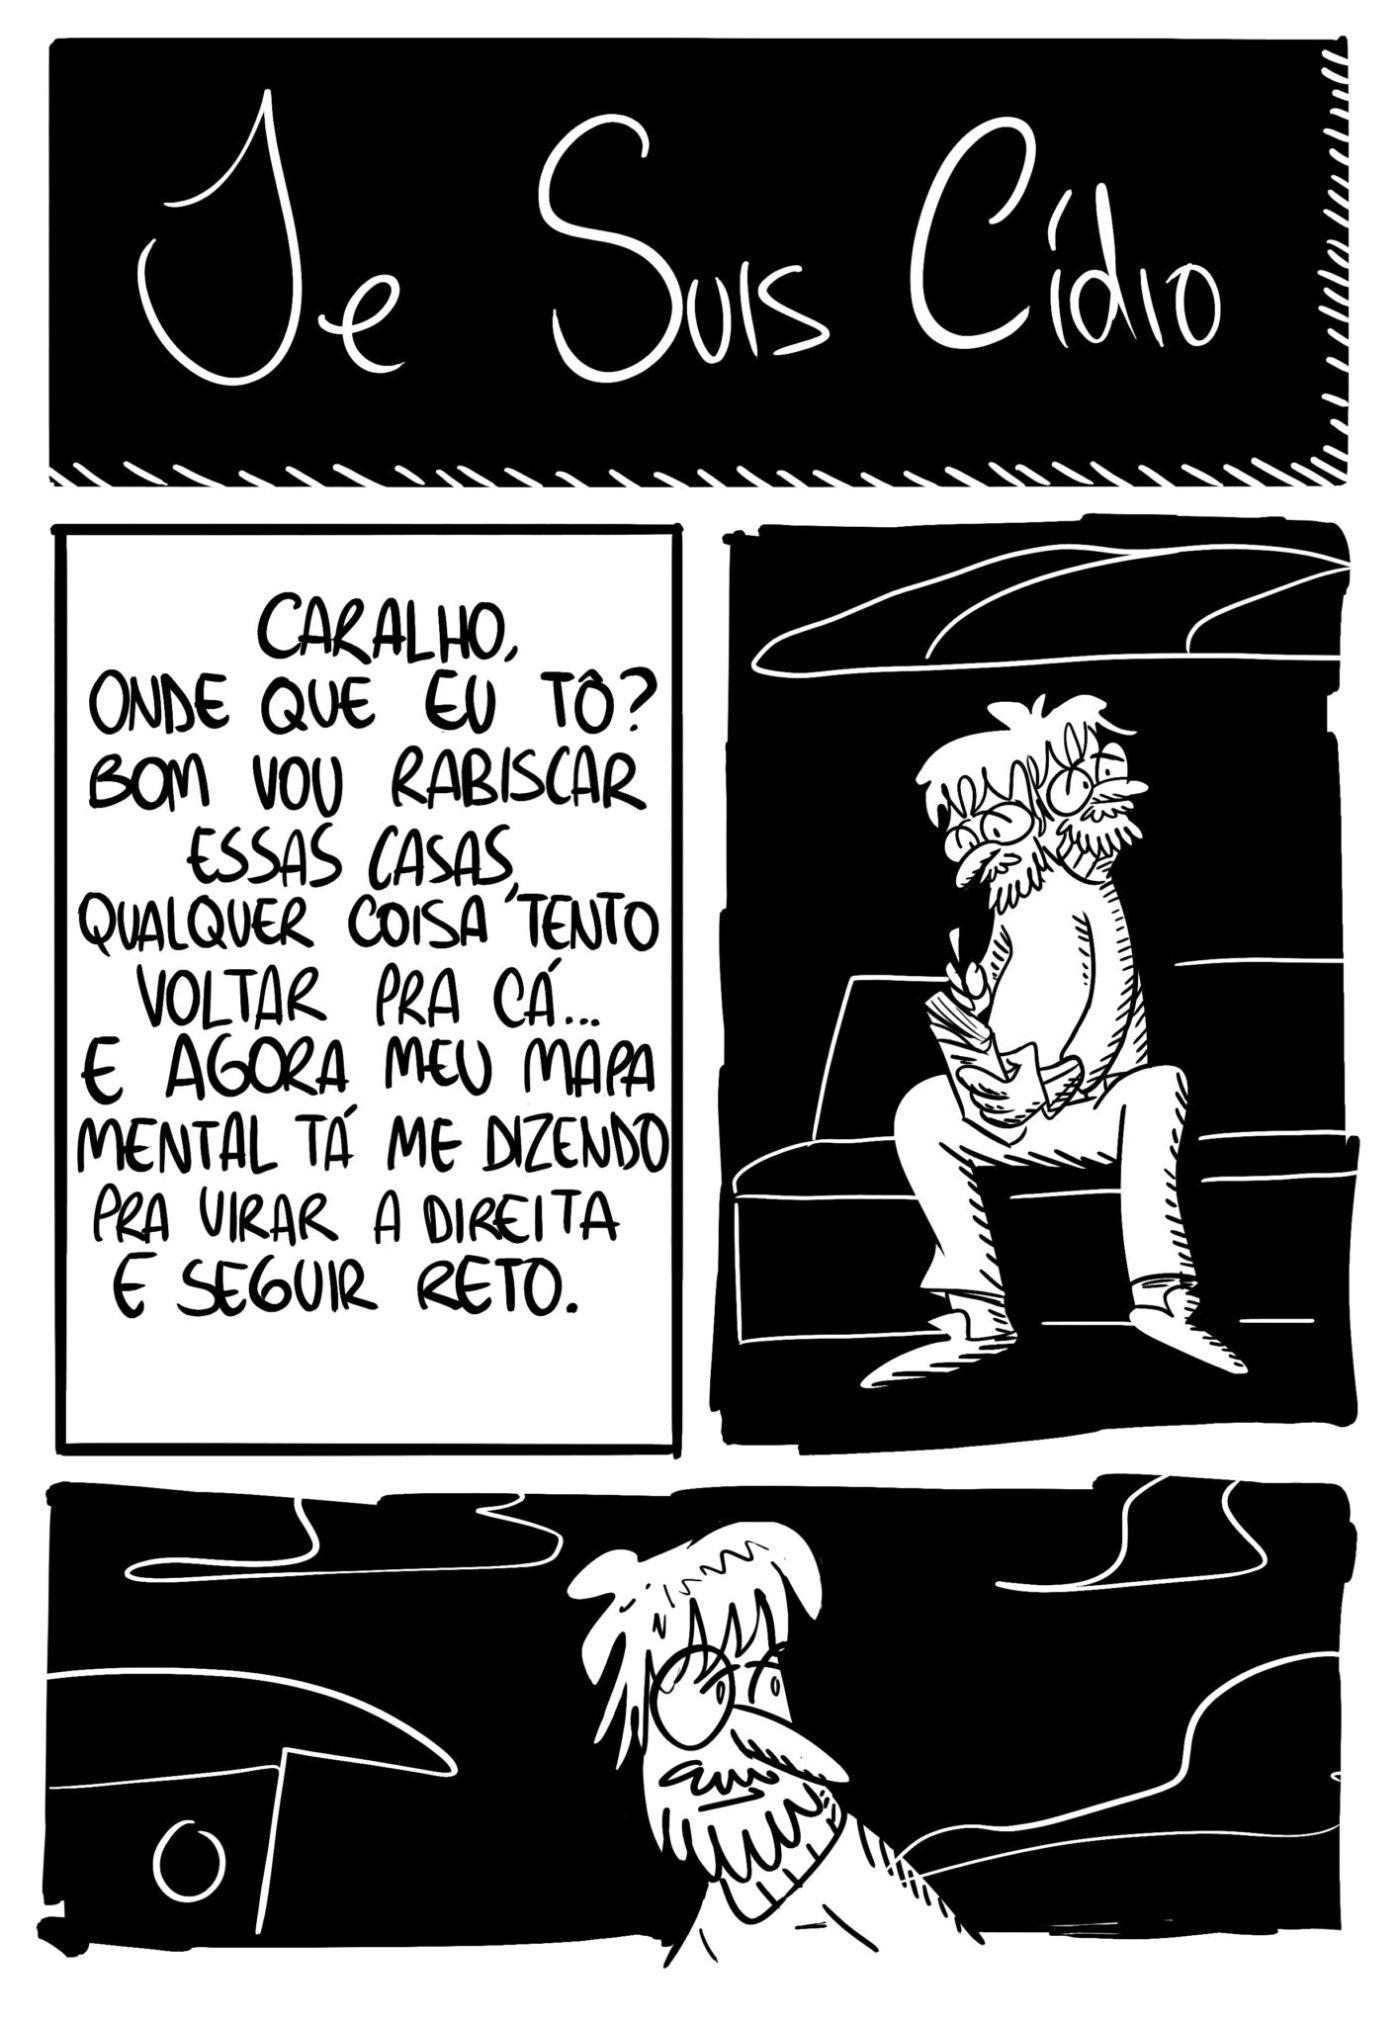 Je Suis Cídio #12, por João B. Godoi